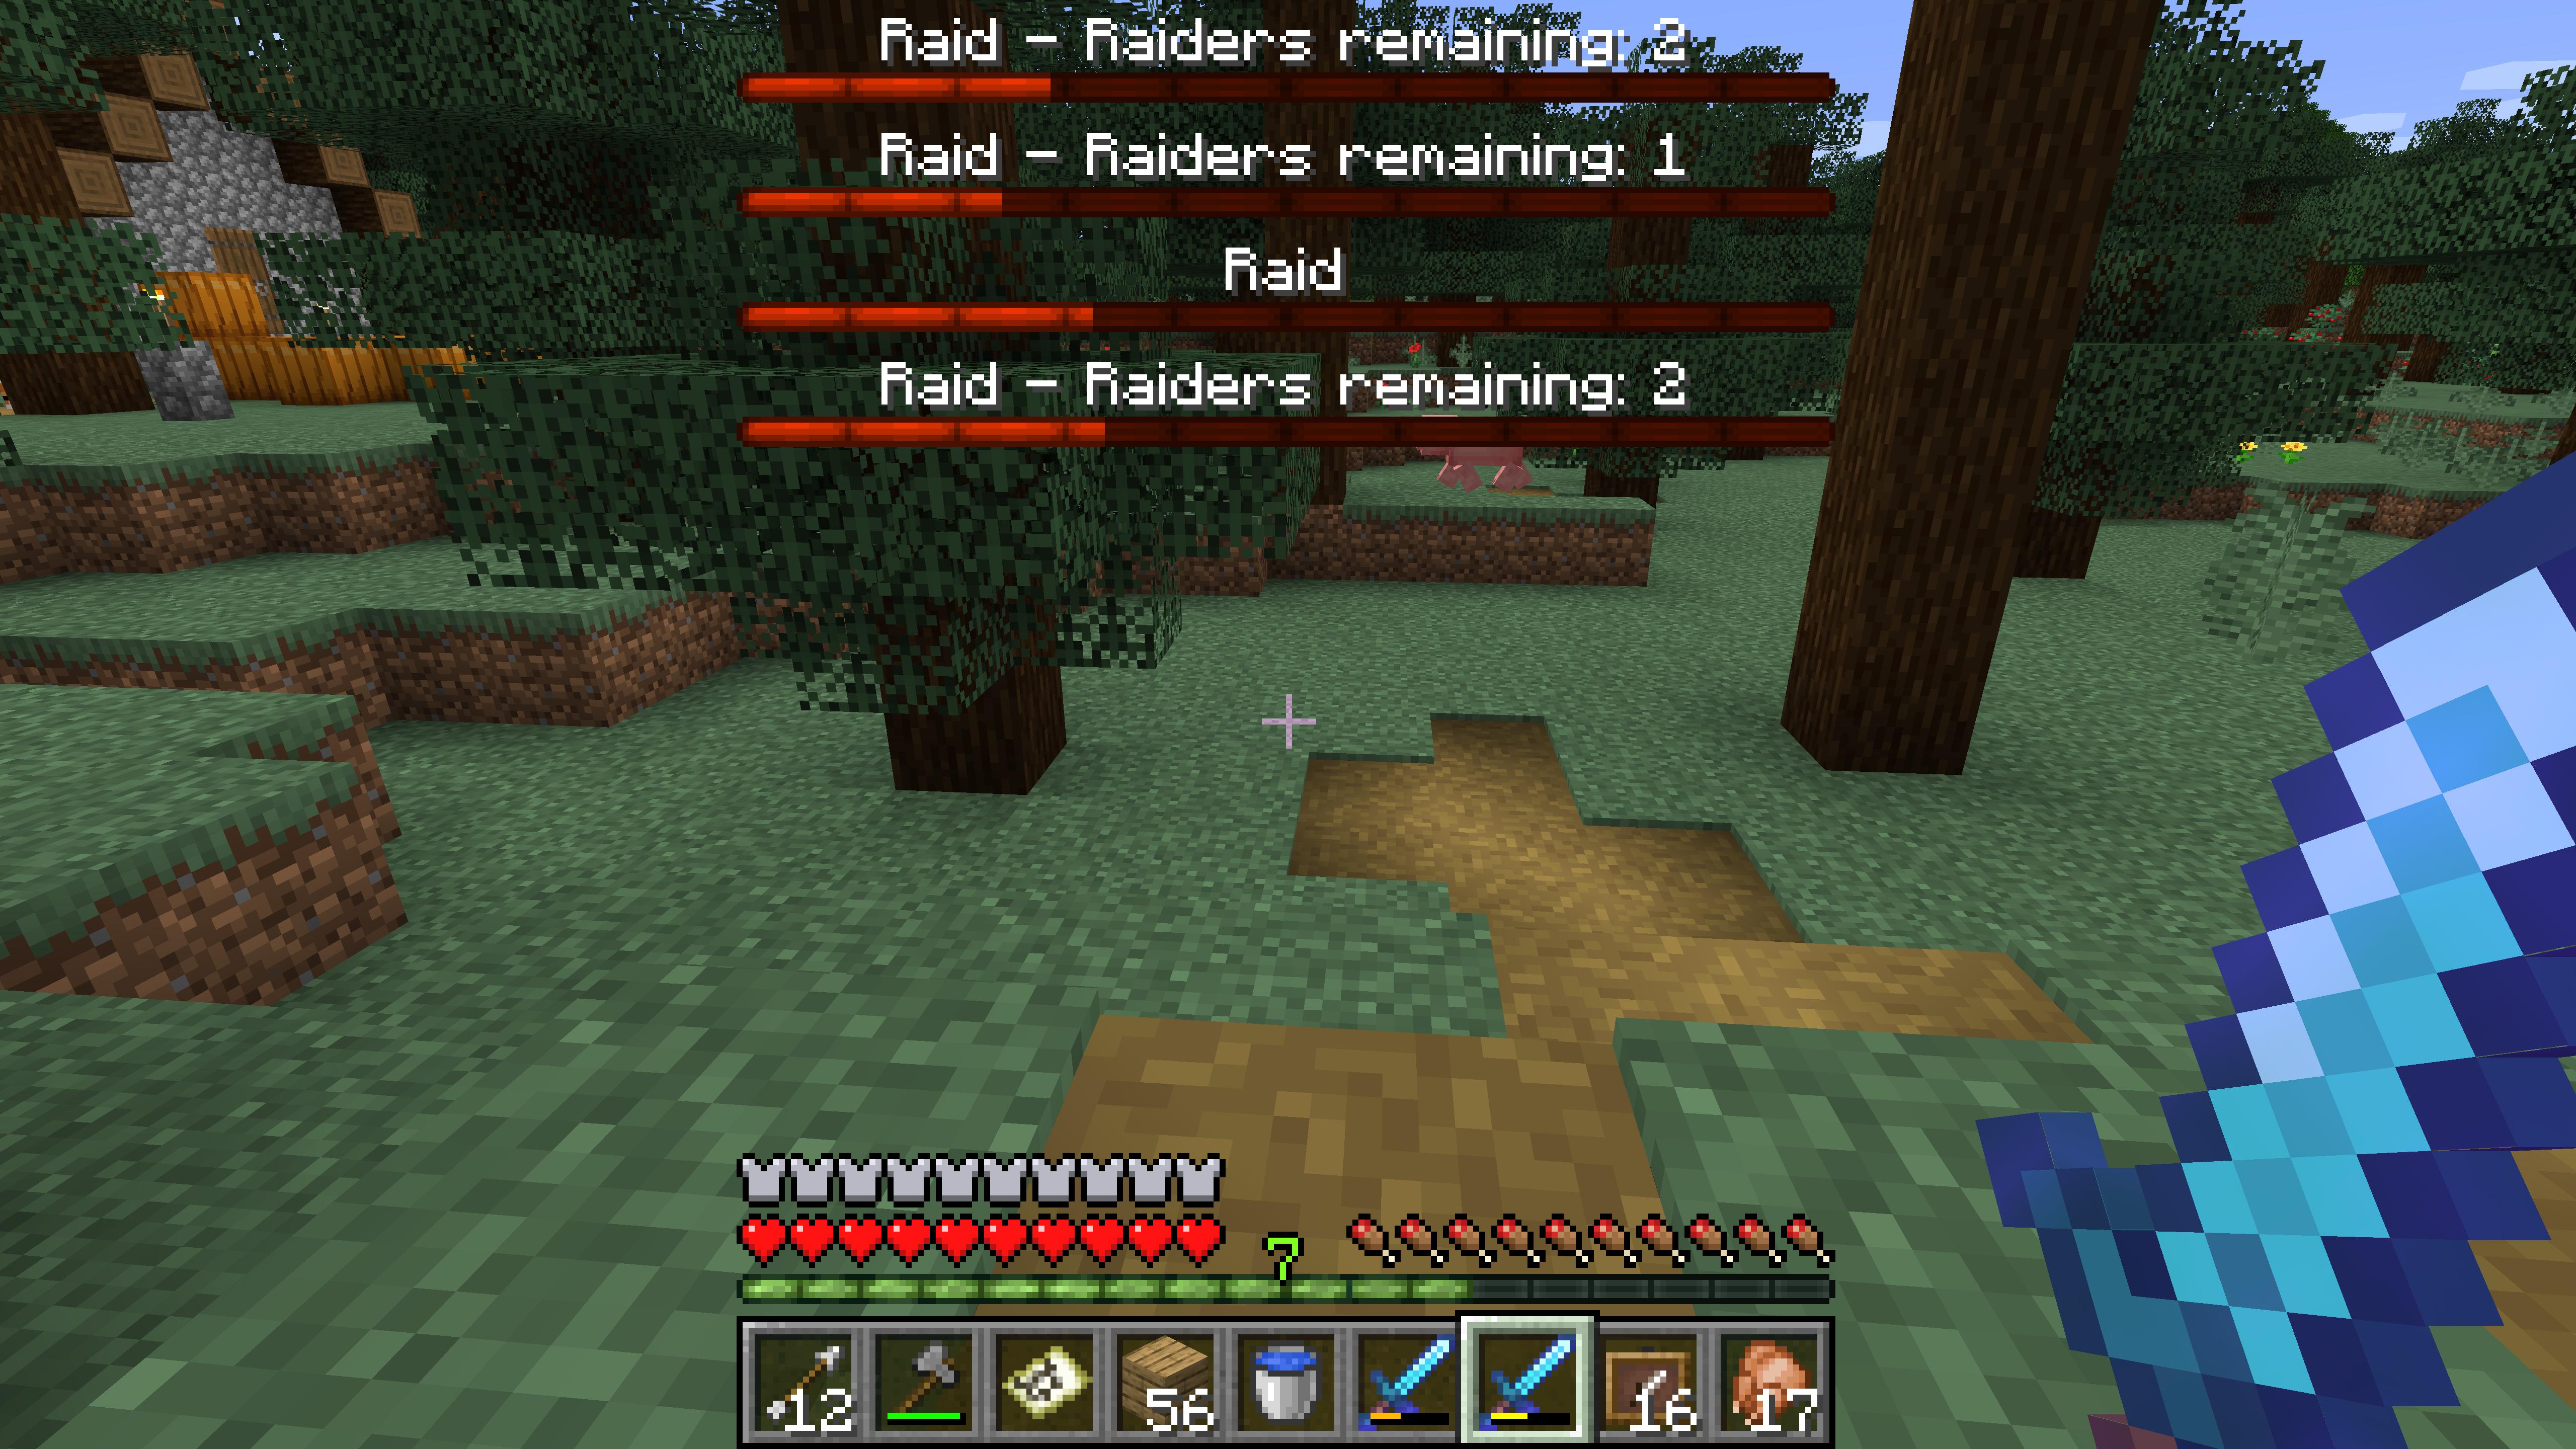 MC-151753] More than one raid can happen in a village - Jira